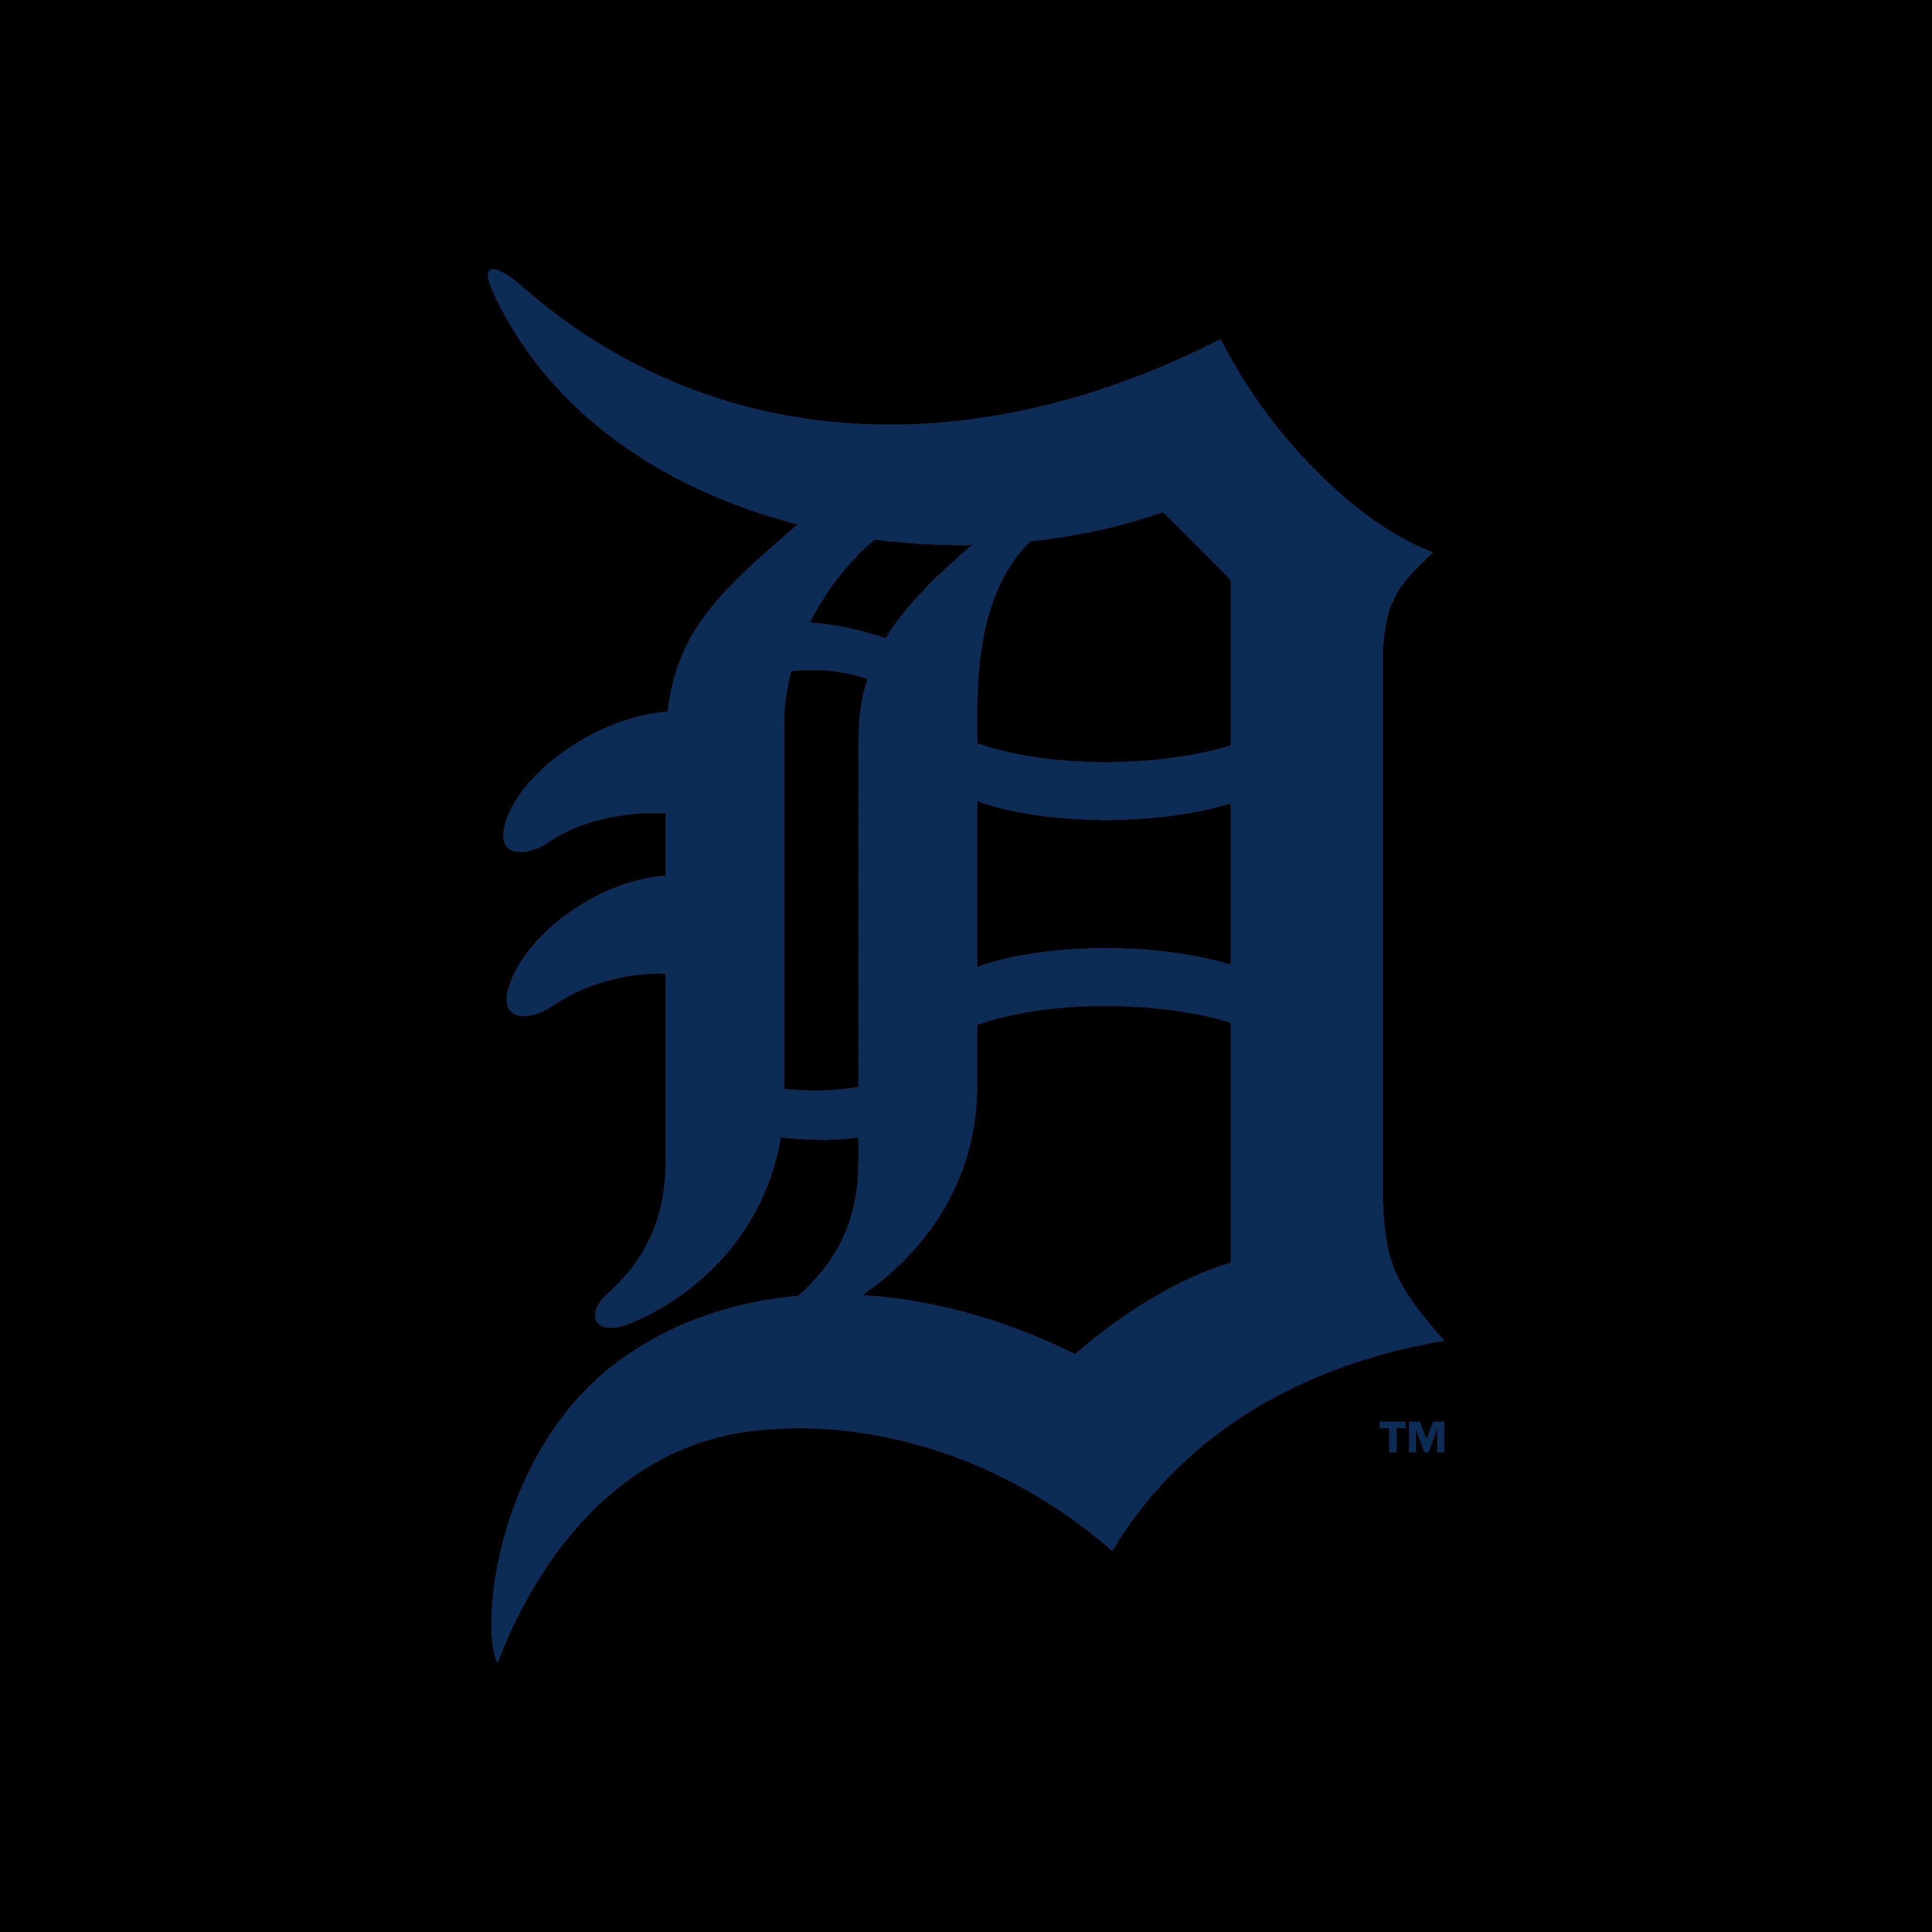 detroit tigers logo 0 - Detroit Tigers Logo